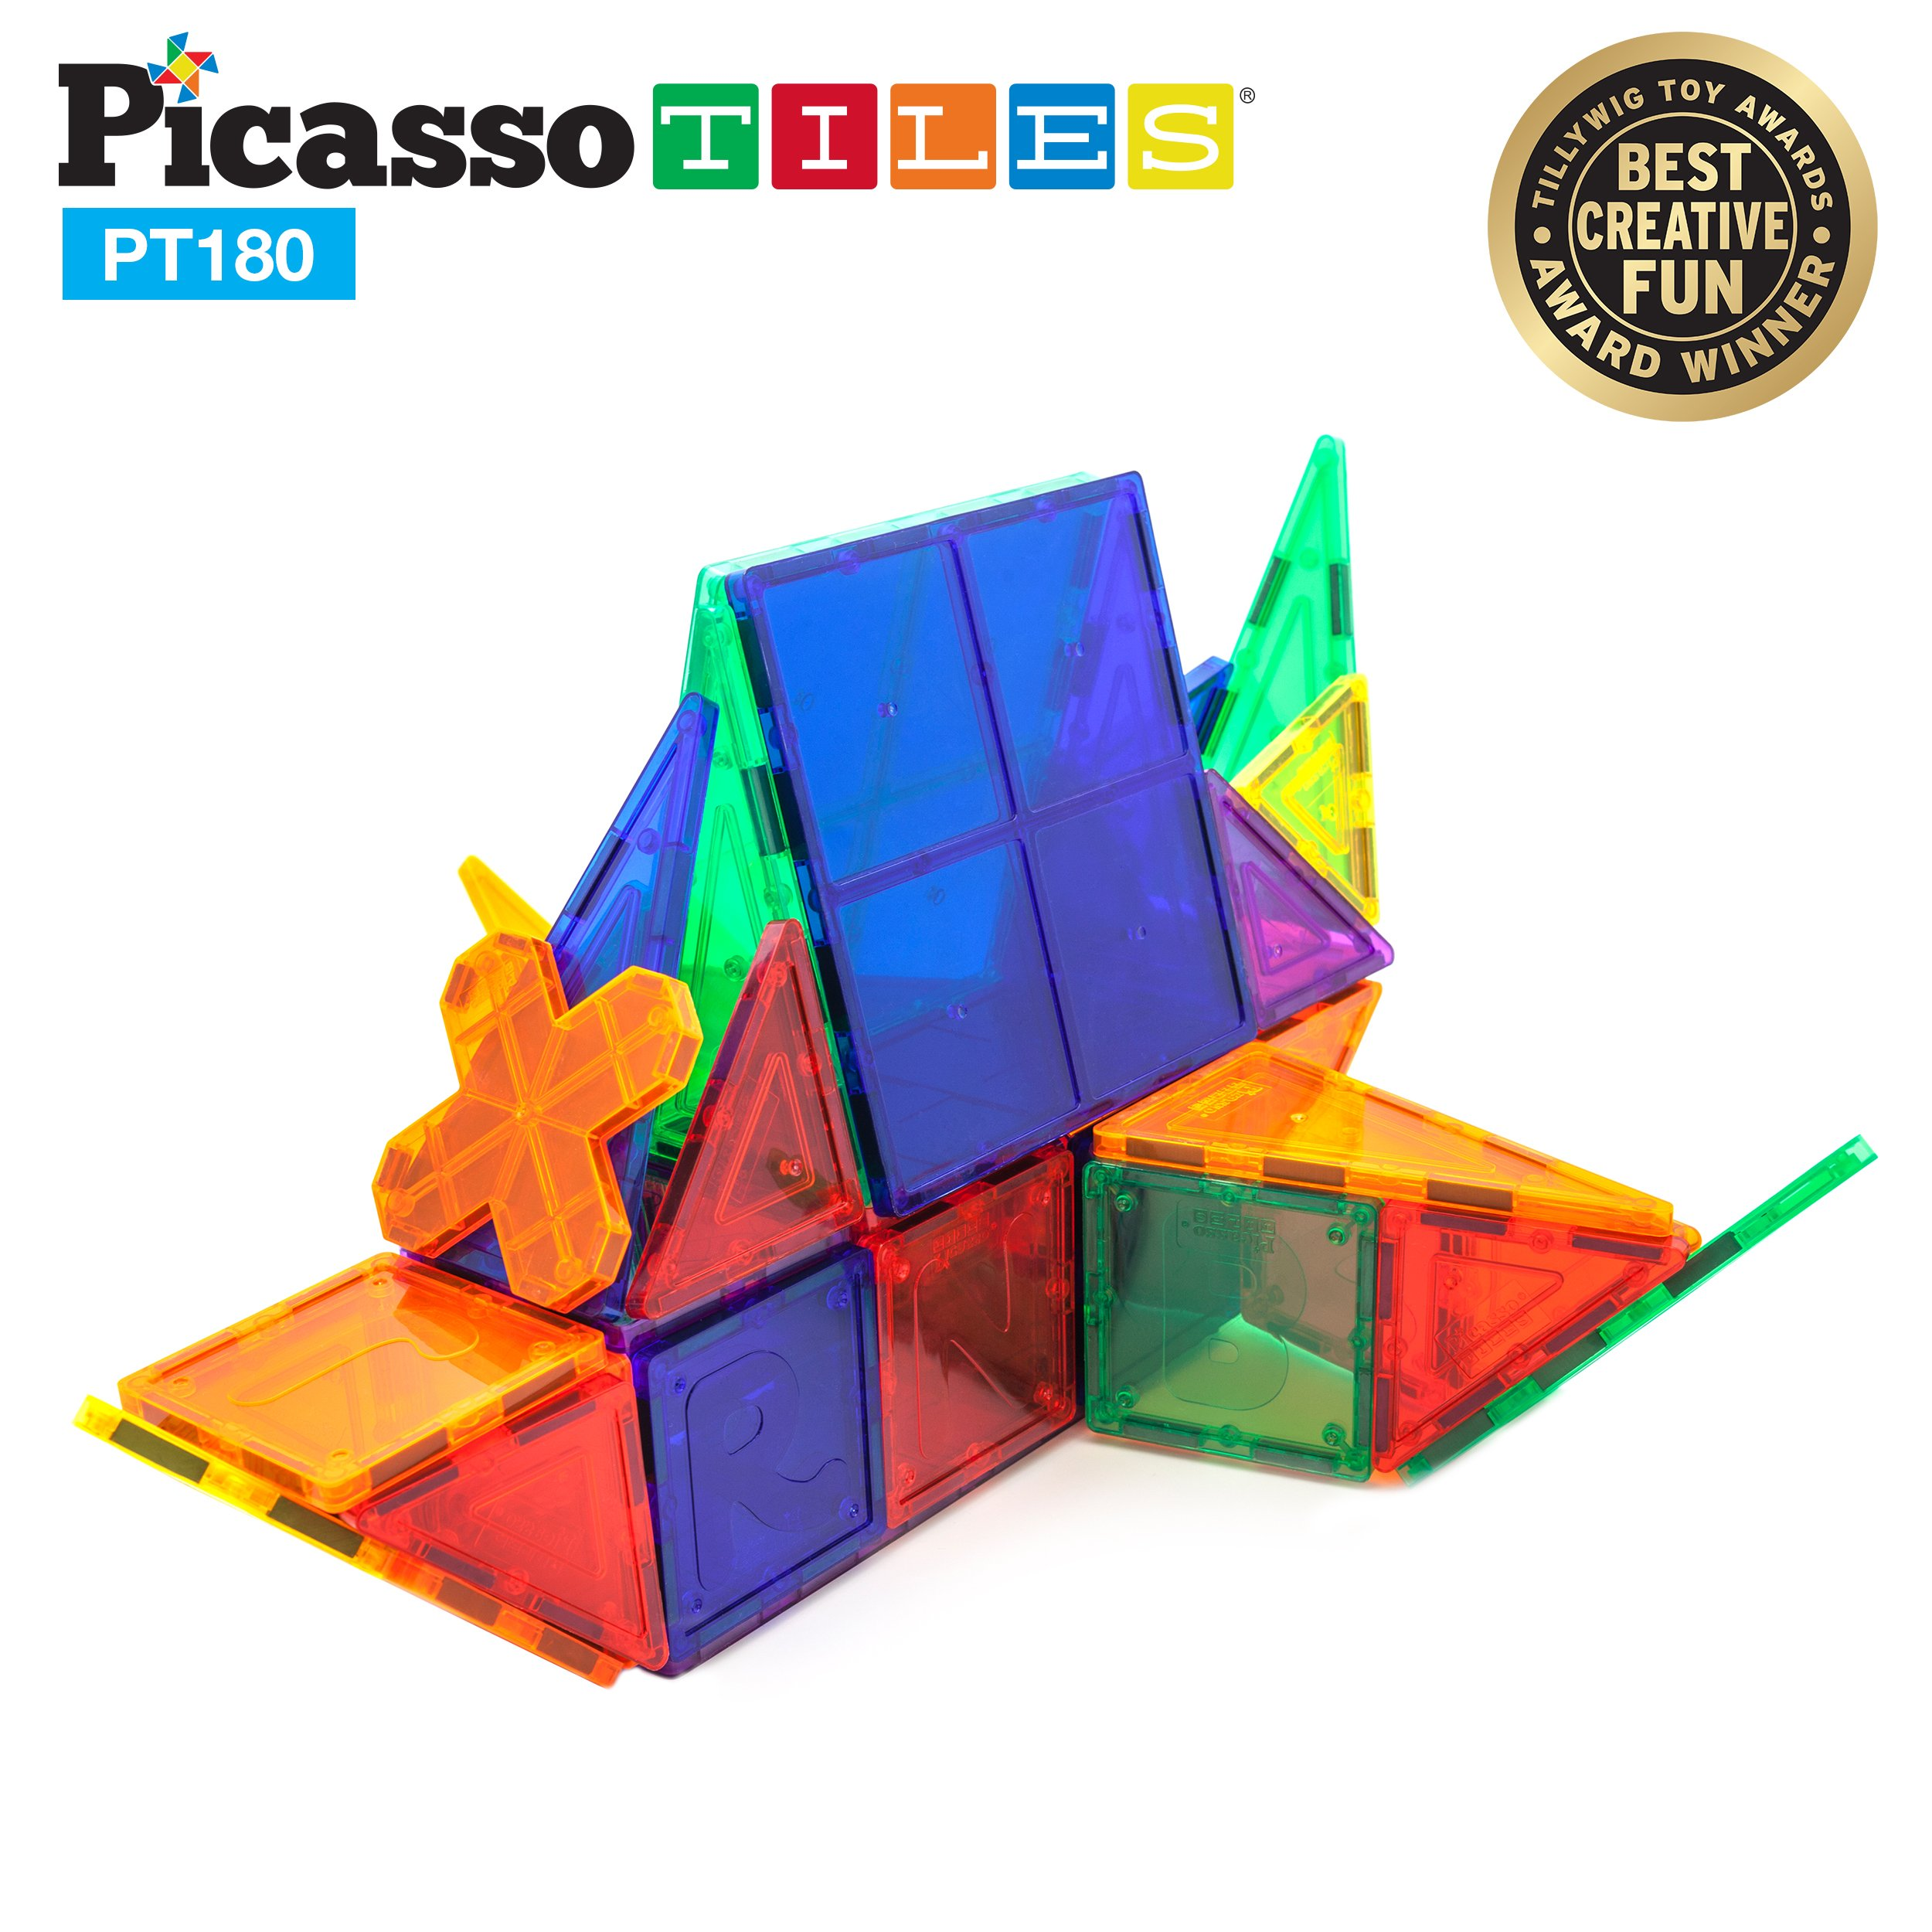 PicassoTiles PT180 Piece Set 180pc Building Block Toy Deluxe Construction Kit Magnet Building Tiles Clear Color Magnetic 3D Construction Playboards Educational Blocks Creativity Beyond Imagination by PicassoTiles (Image #6)